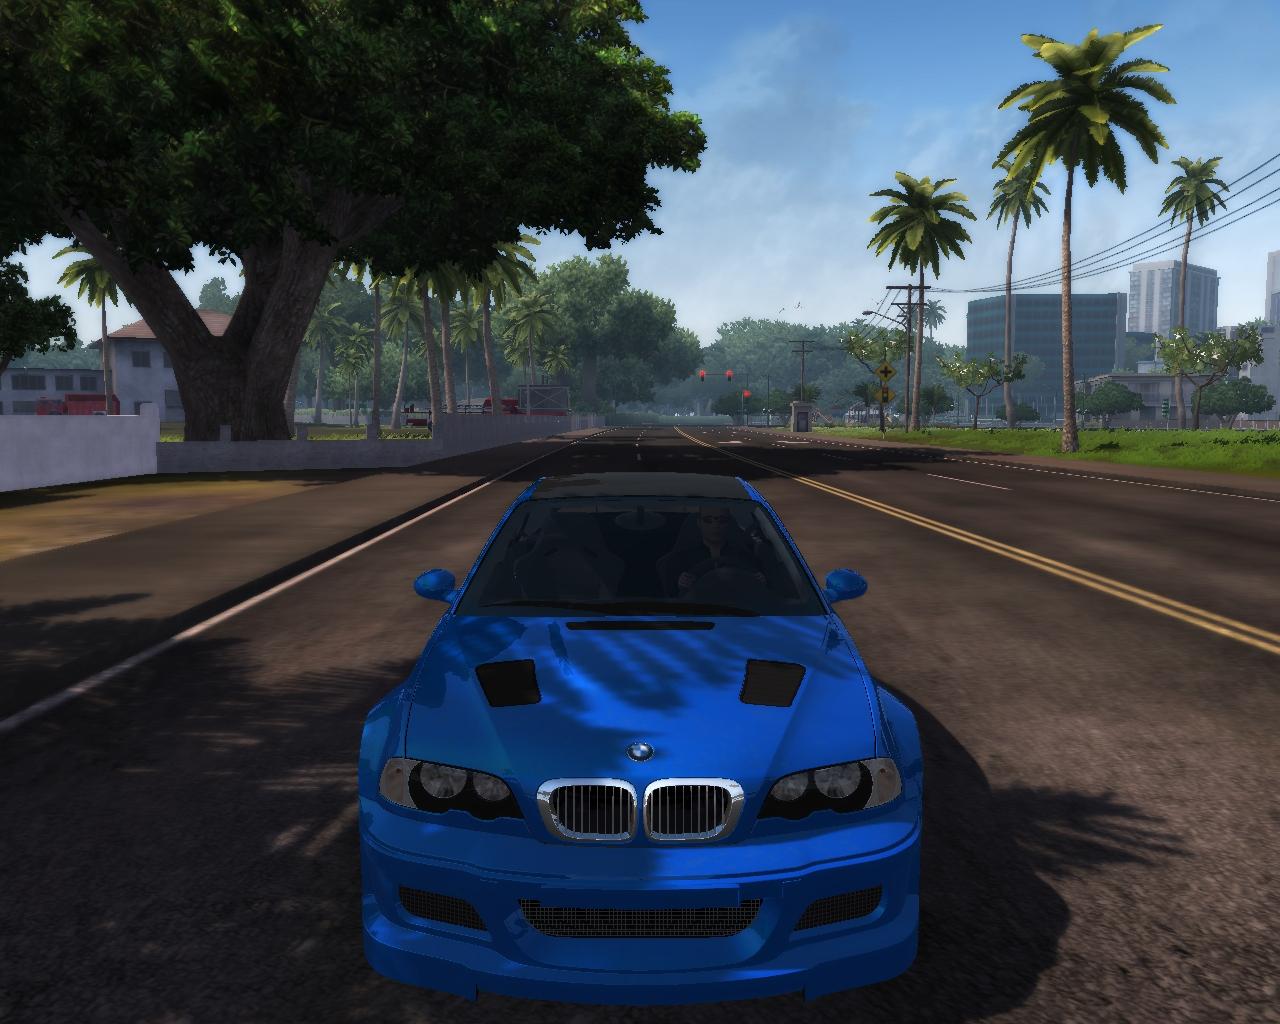 BMW M3 E46 GTR 2005 - Test Drive Unlimited 2 BMW M3 E46, test drive unlimited